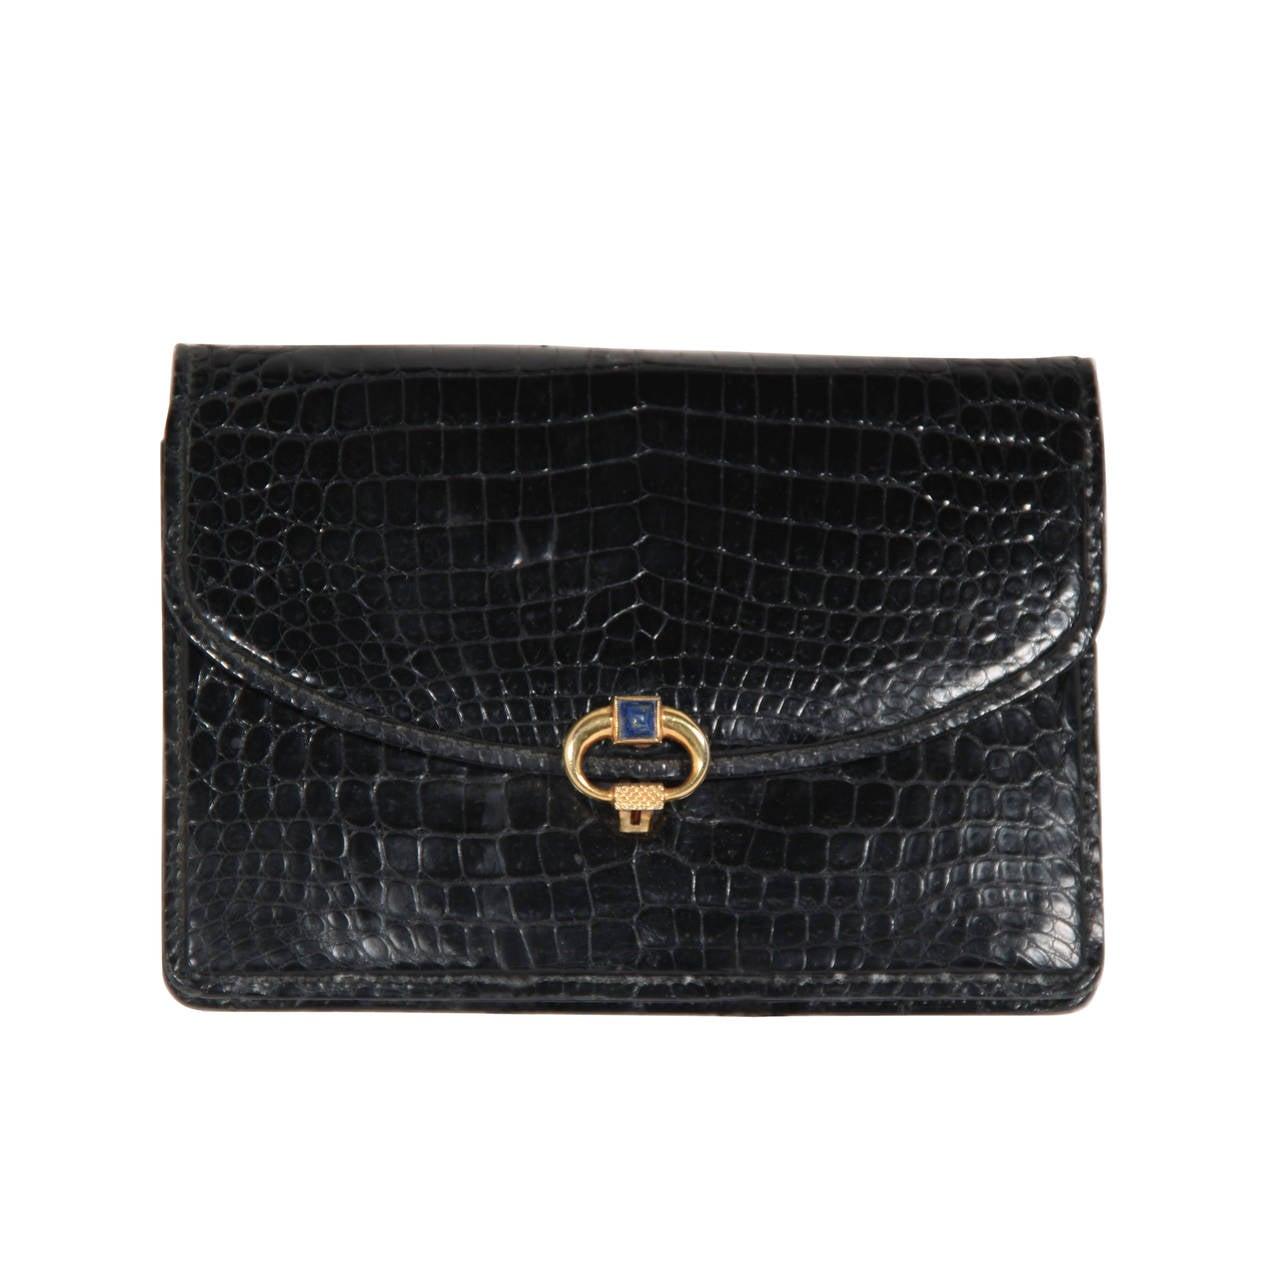 Gucci Exceptional Large Gucci Black Lizard Clutch 80s fNlaj1Fv